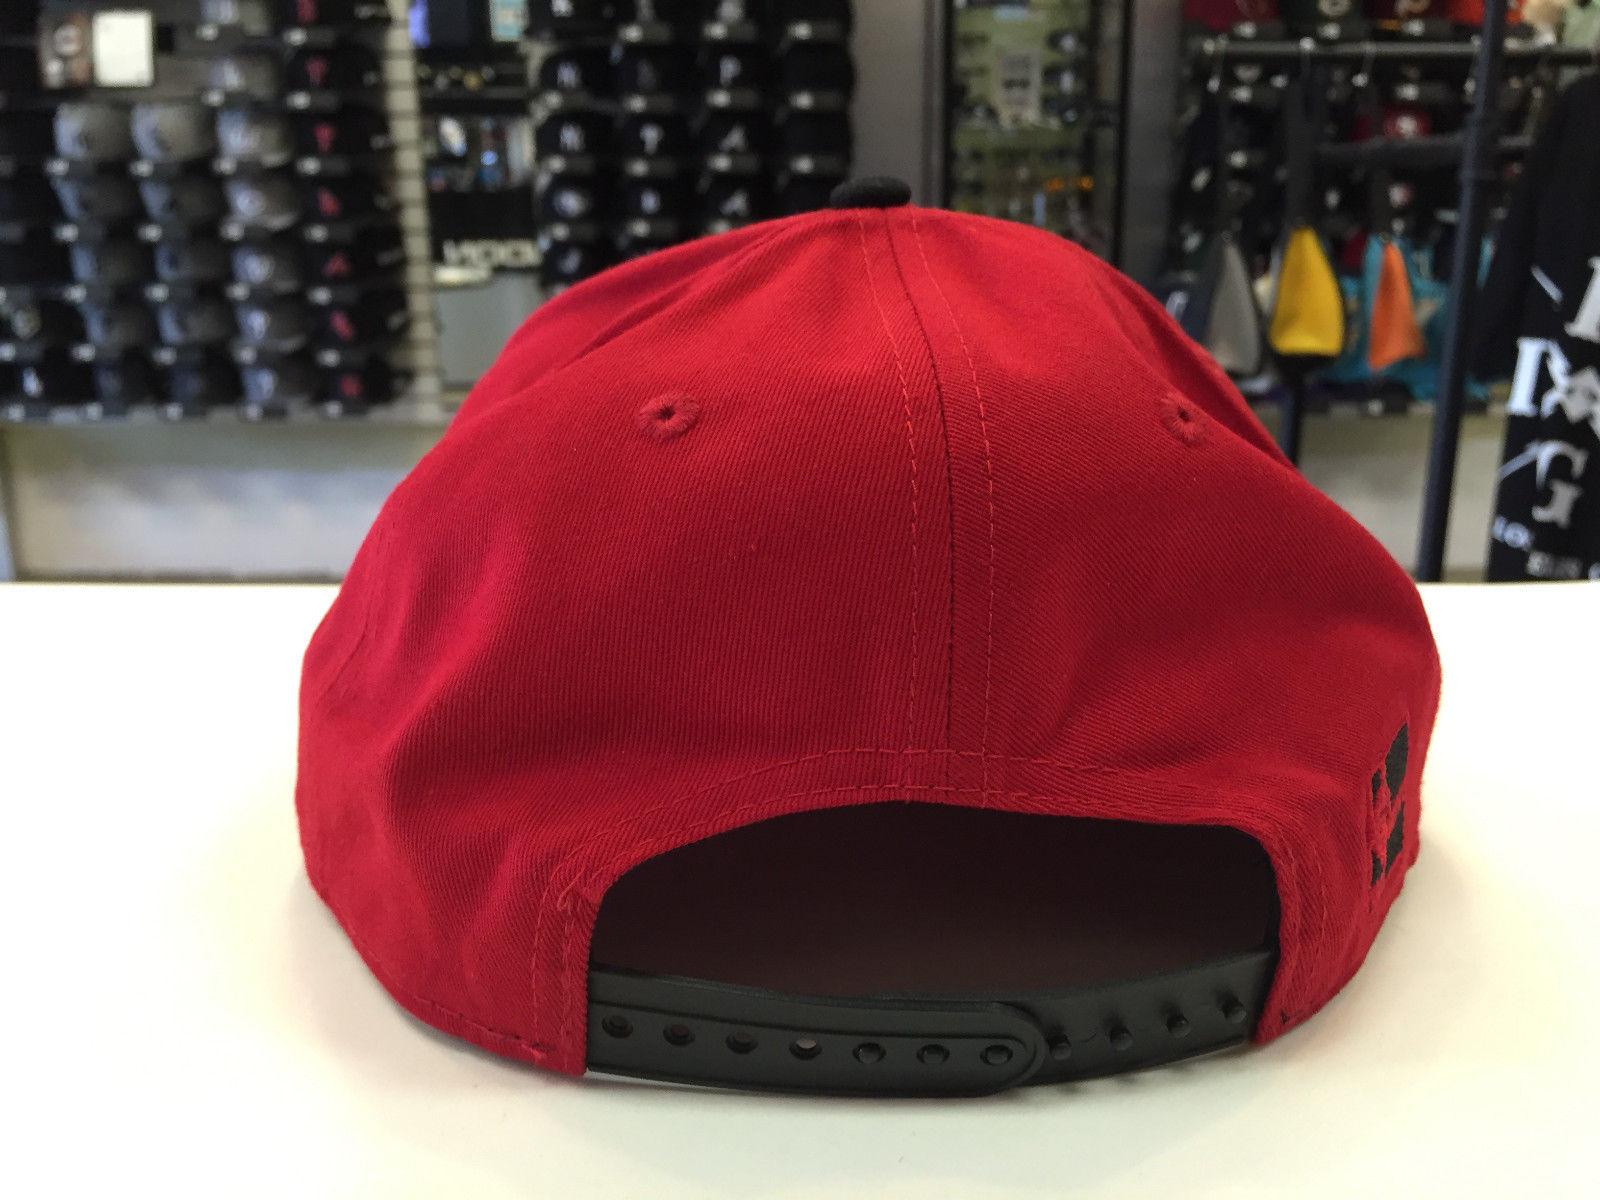 New Era 9FIFTY NBA Miami Heat Pinna Snapback Cap Hat #6556